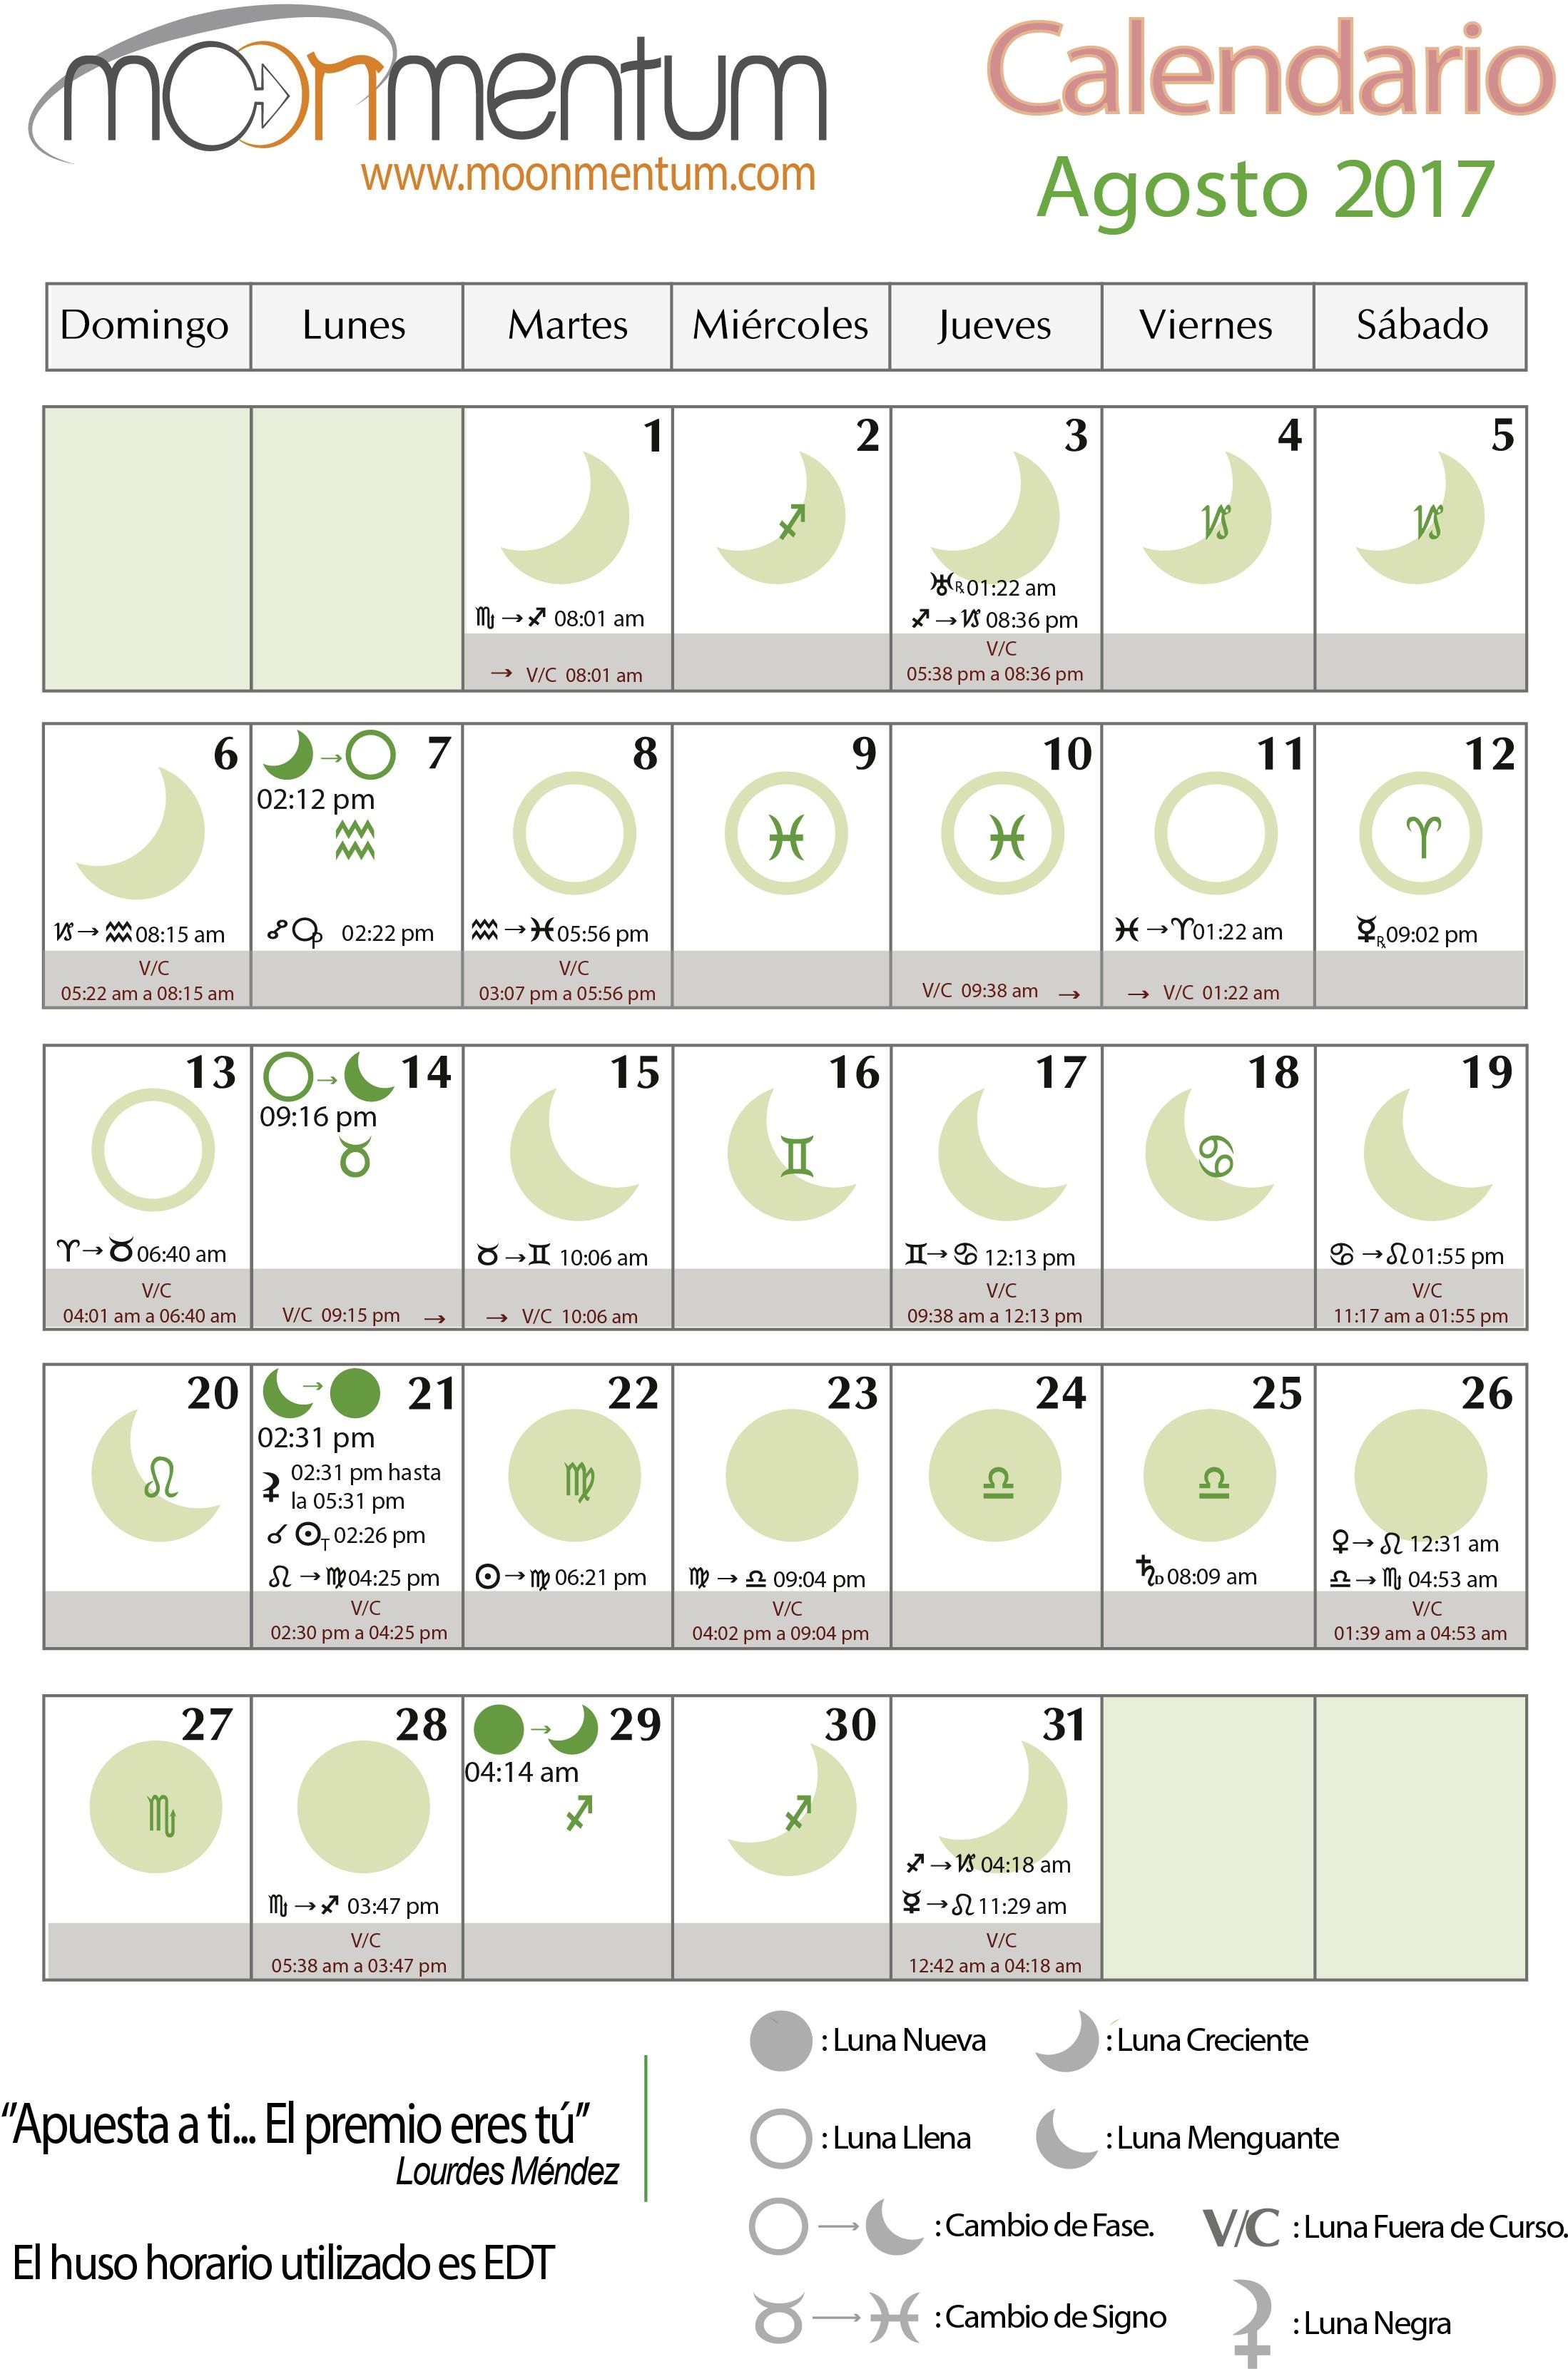 Calendario Agosto 2017 de moonmentum Haz click para imprimir